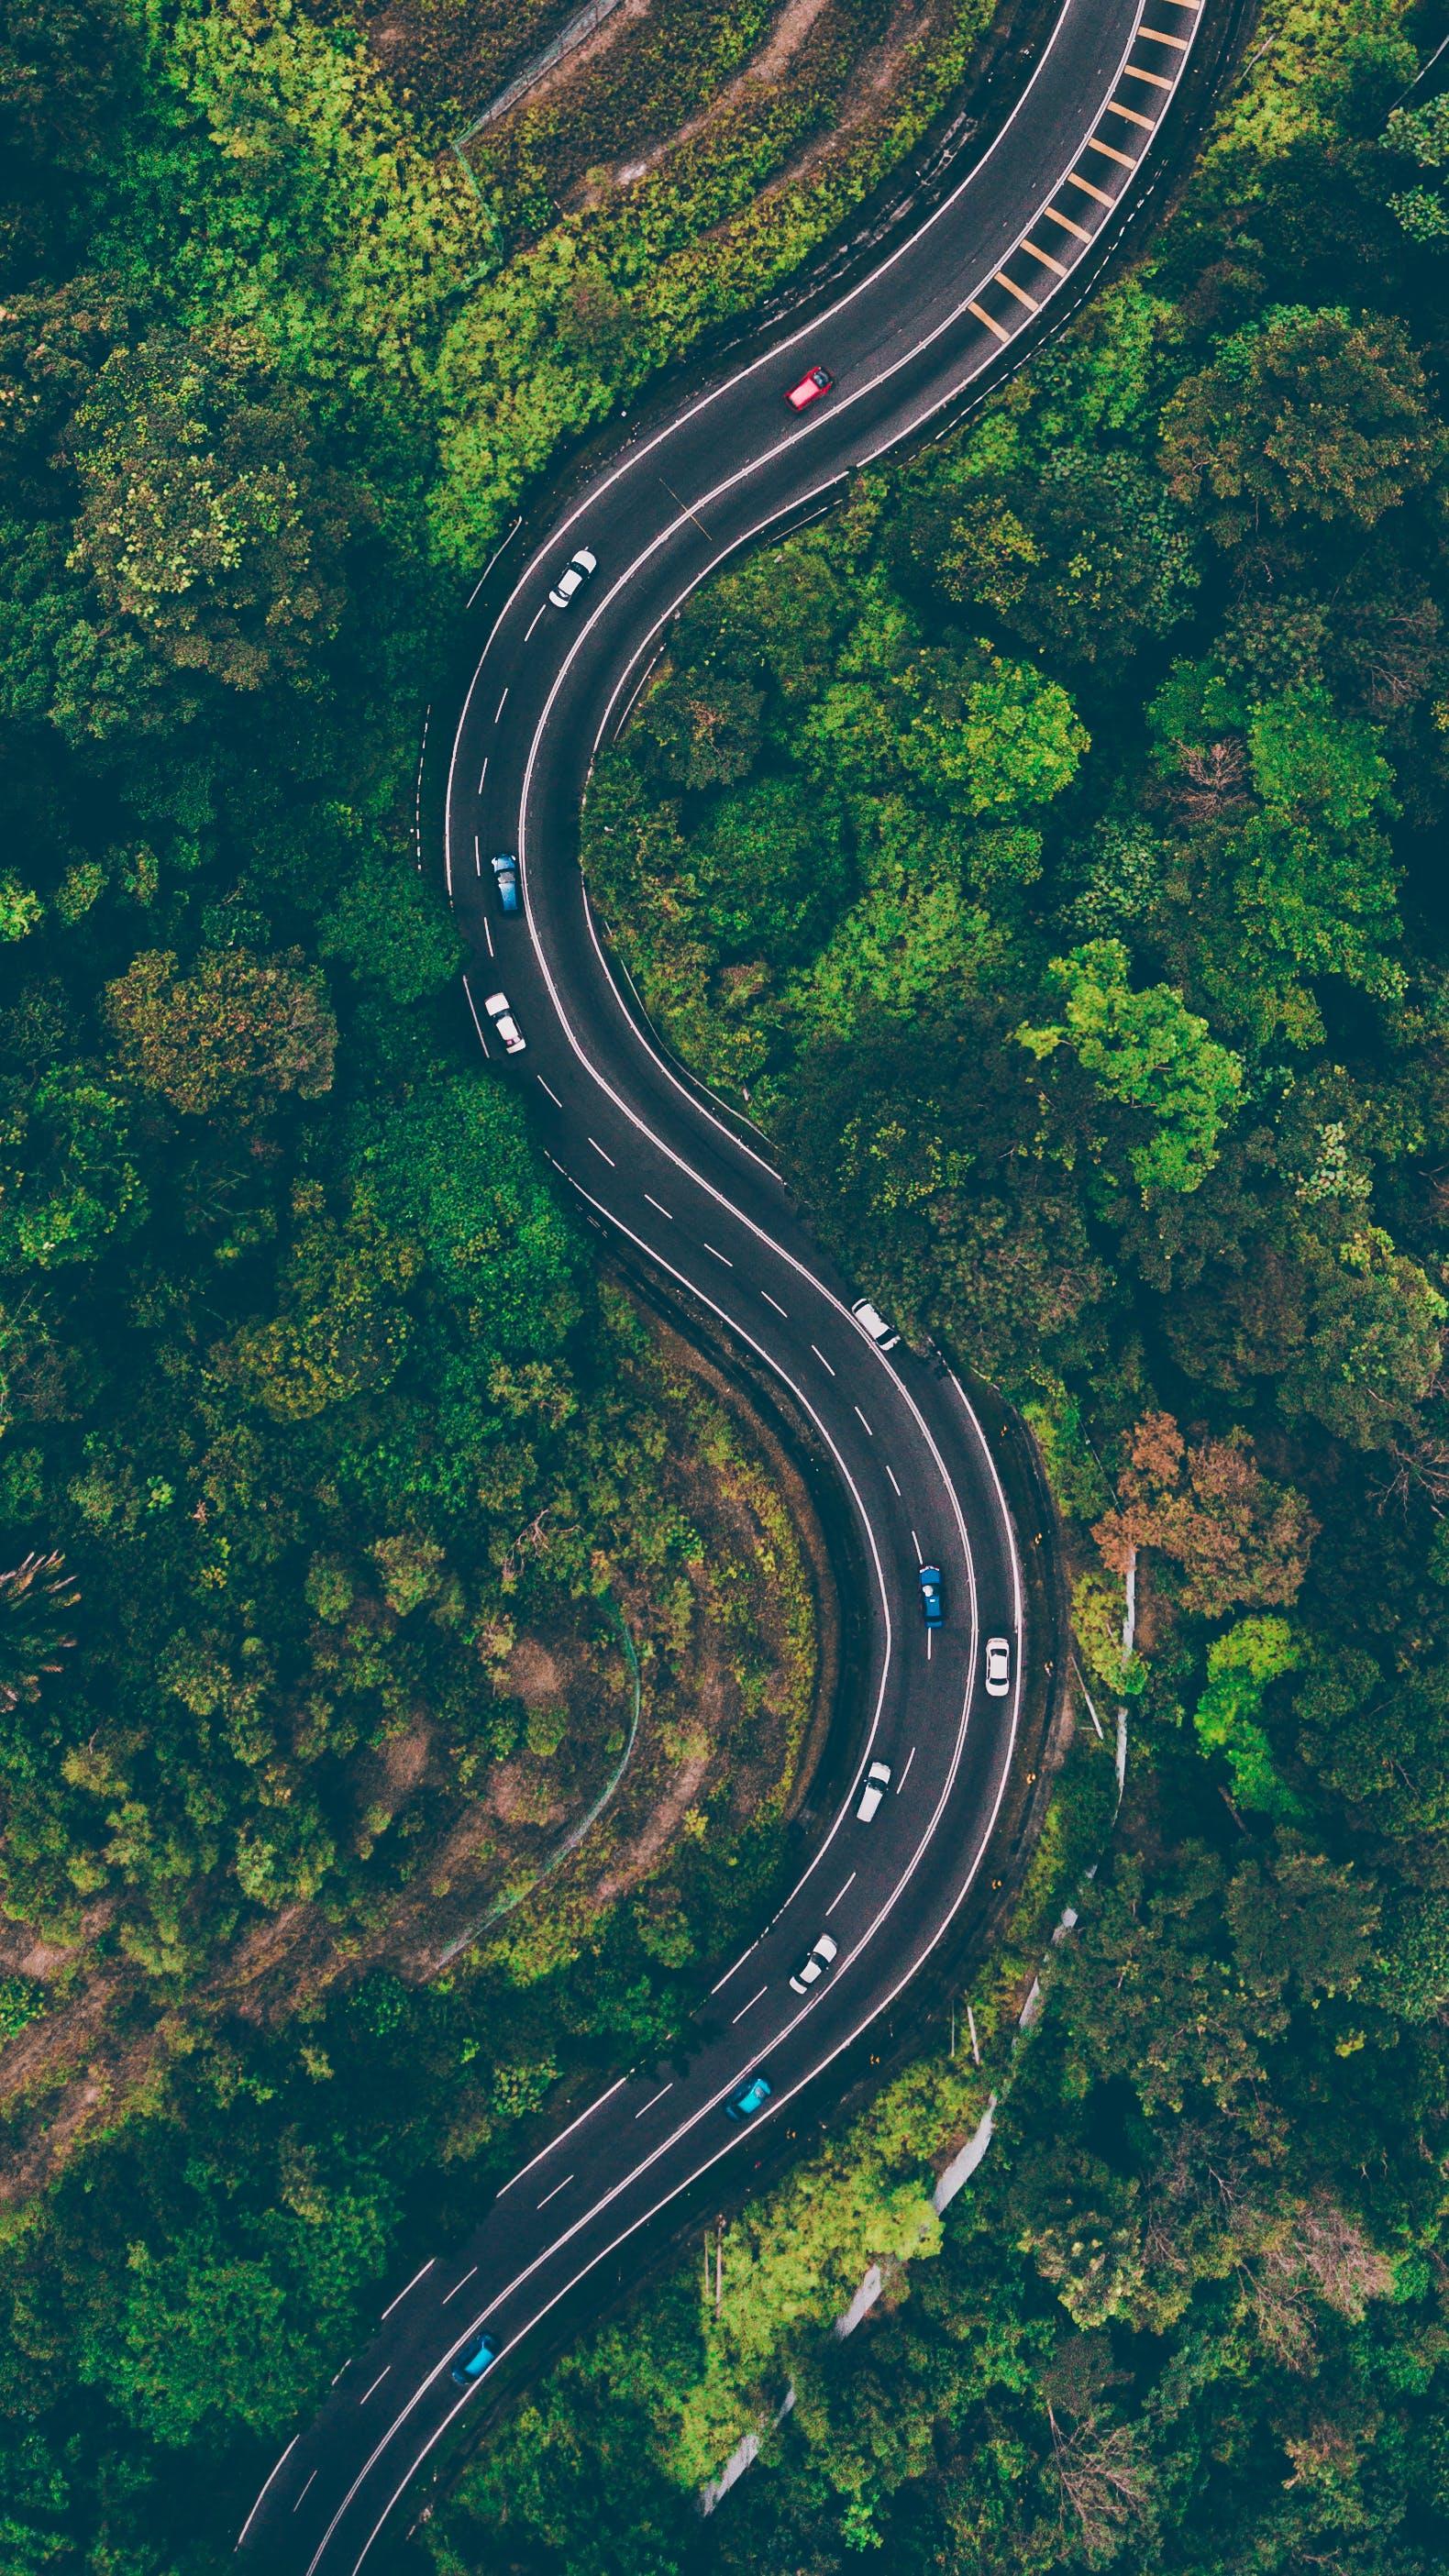 Kostenloses Stock Foto zu autobahn, bäume, fahrzeuge, kurve